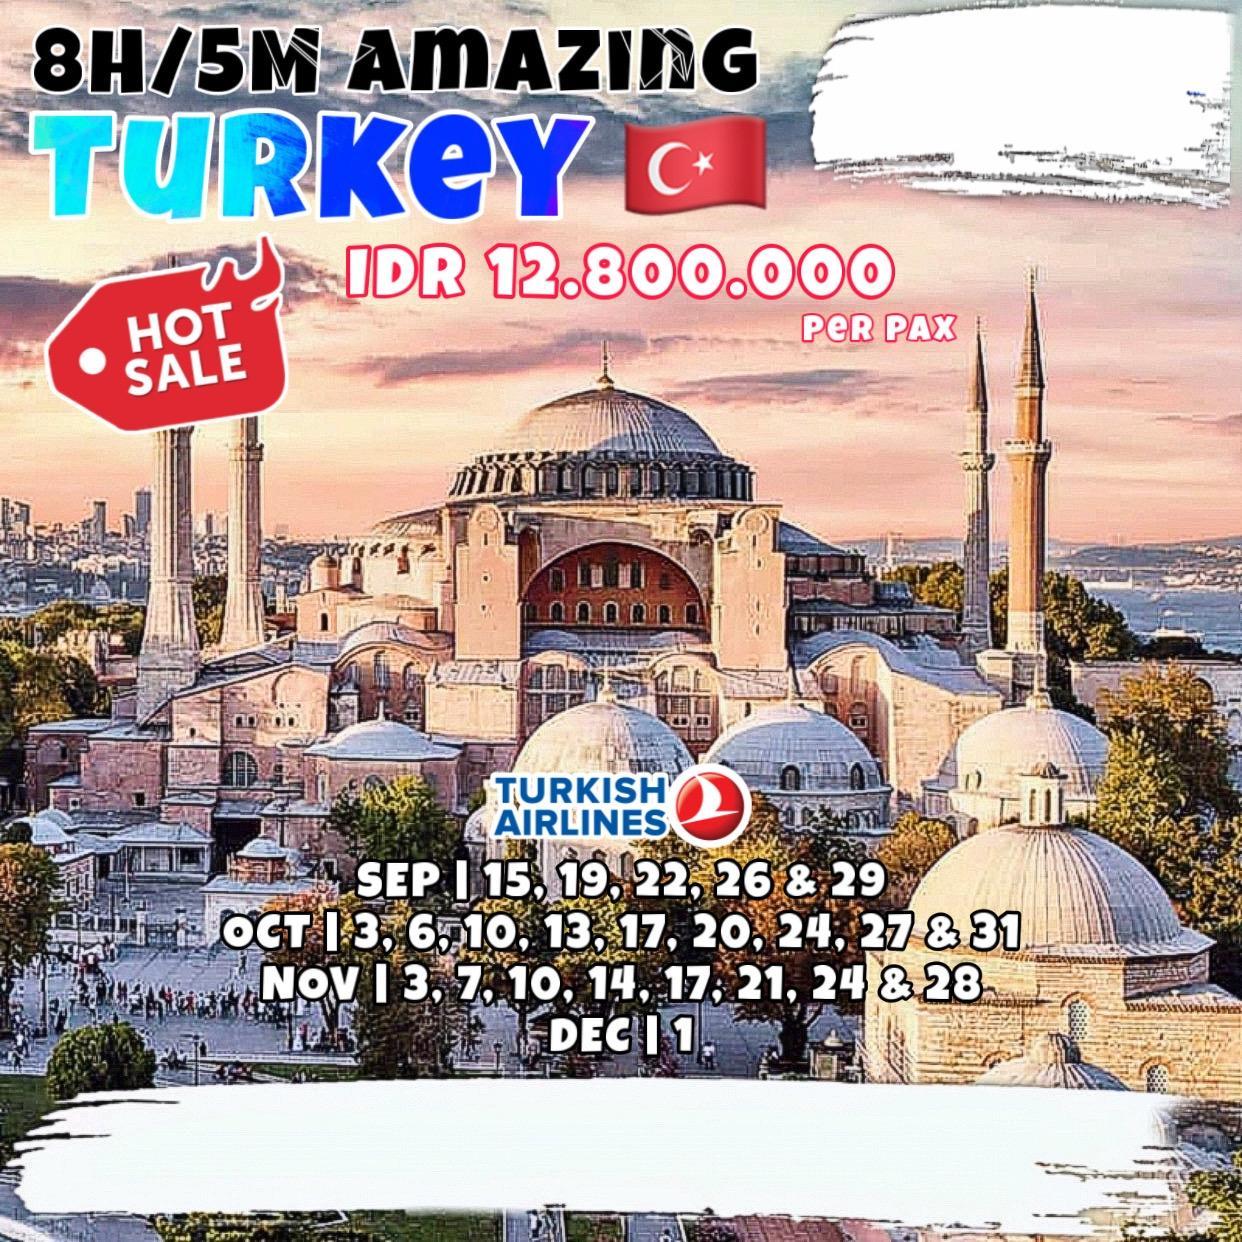 8H/5M AMAZING TURKEY